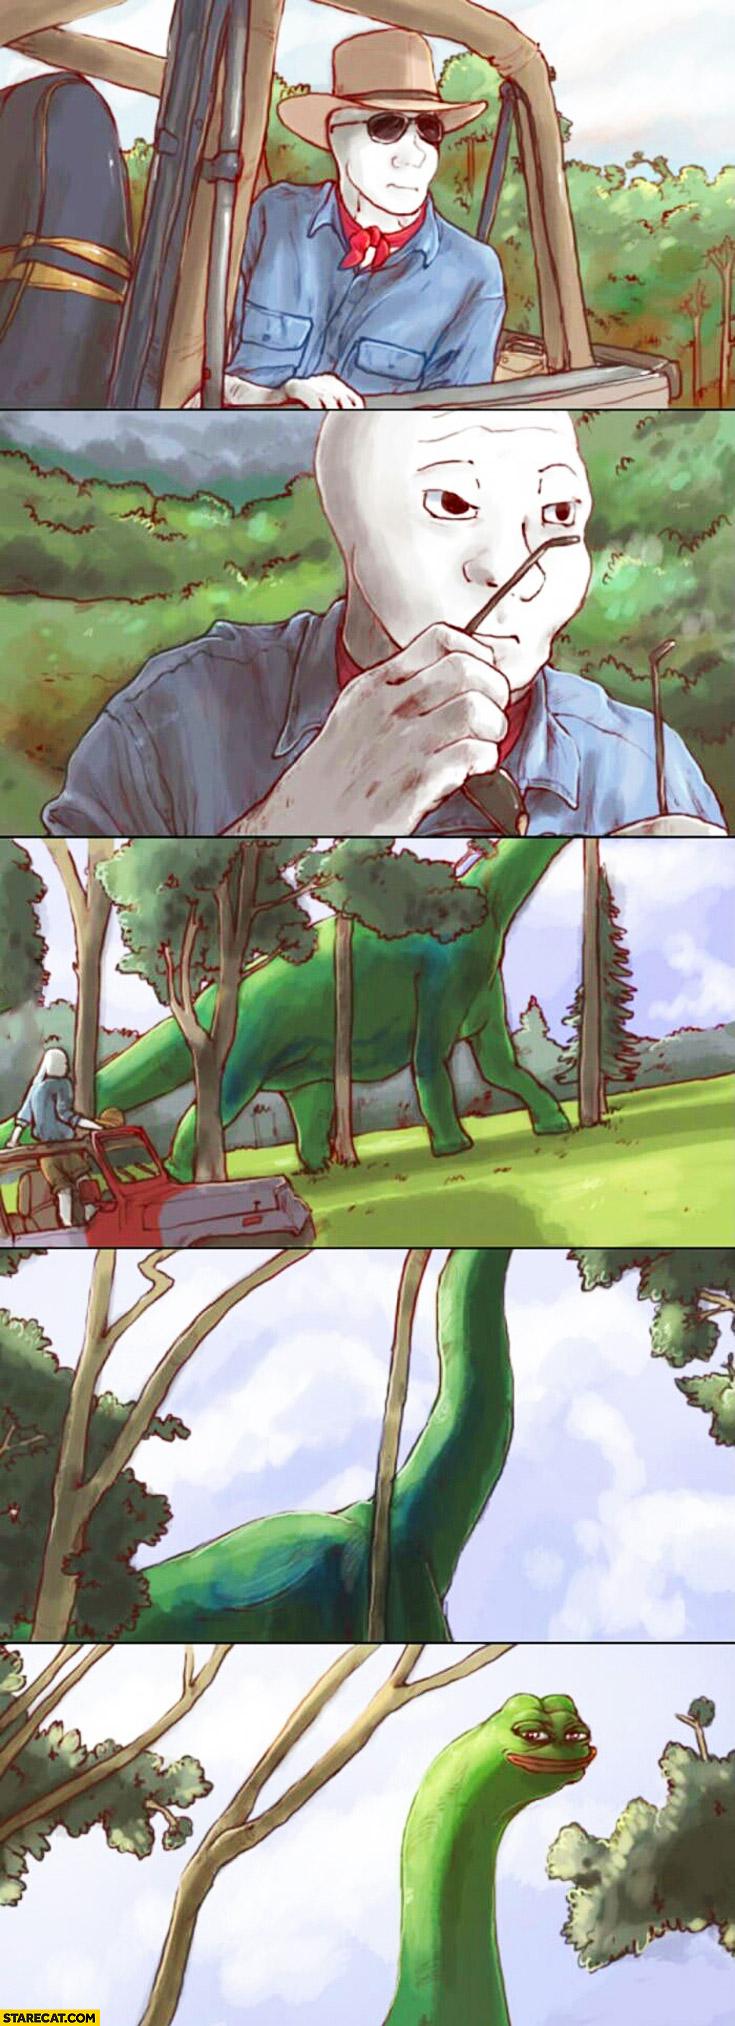 Jurassic Park comic meme characters pepe frog sad